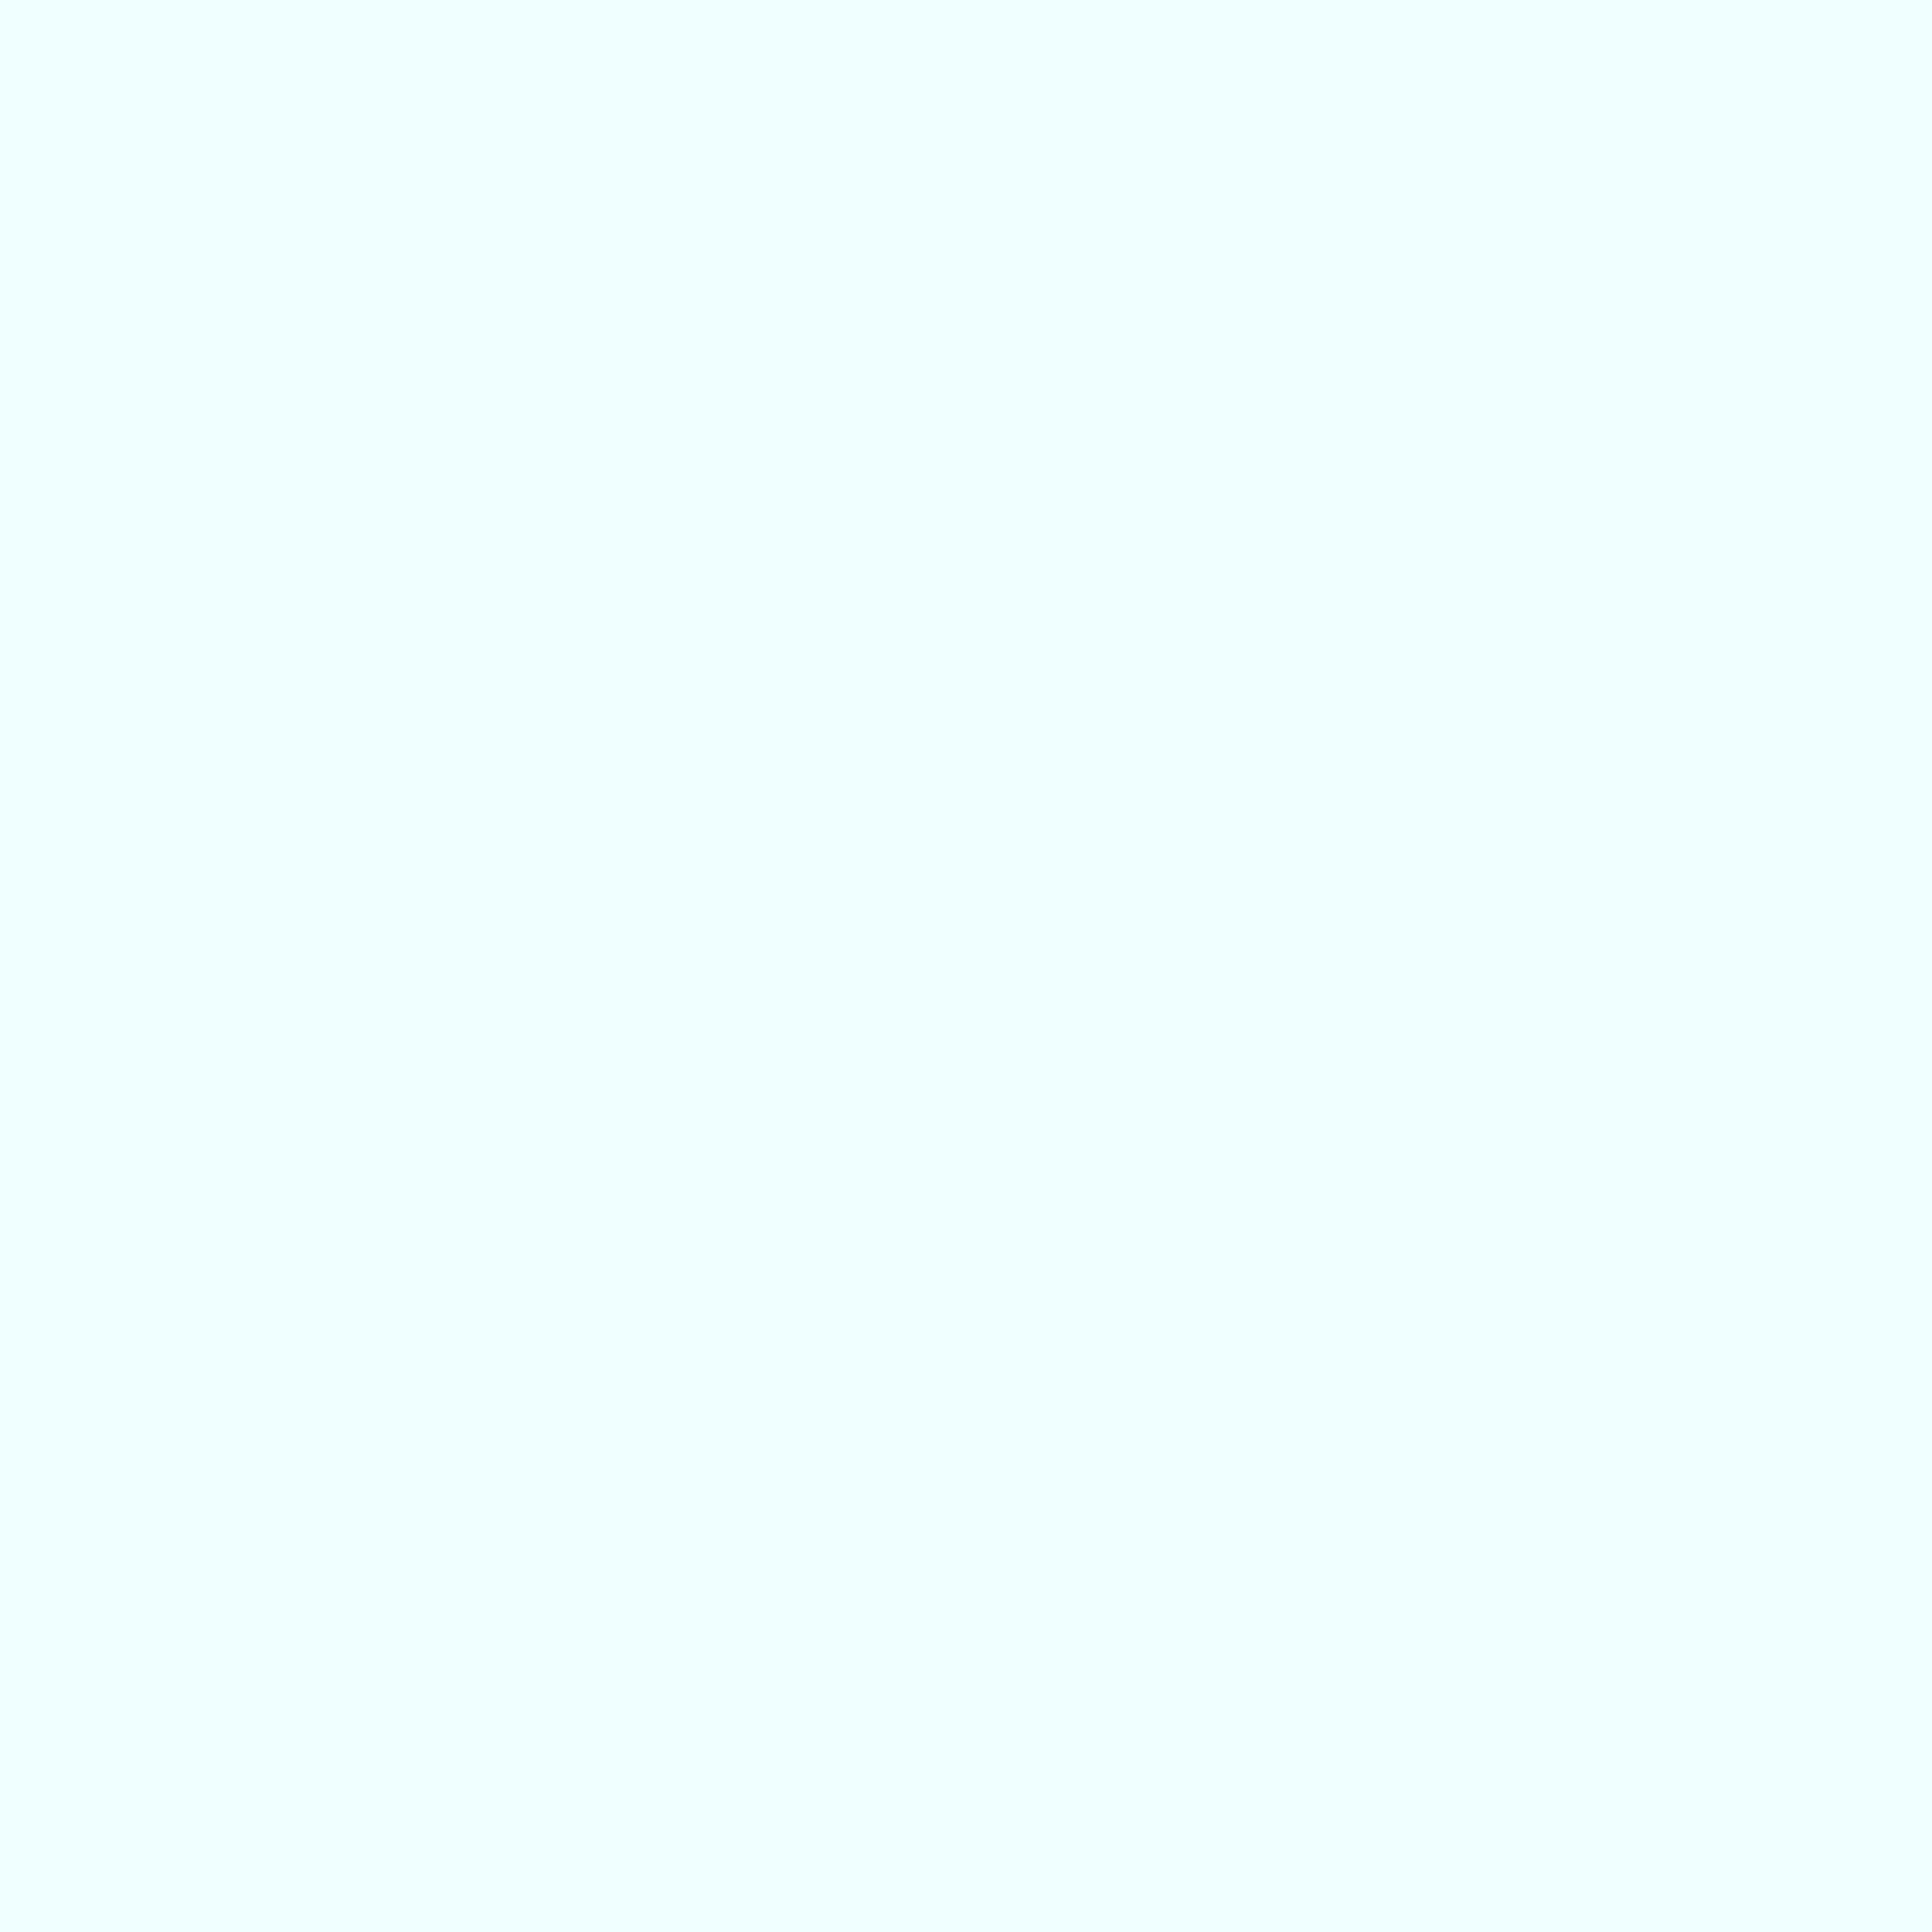 2048x2048 Azure Mist Solid Color Background